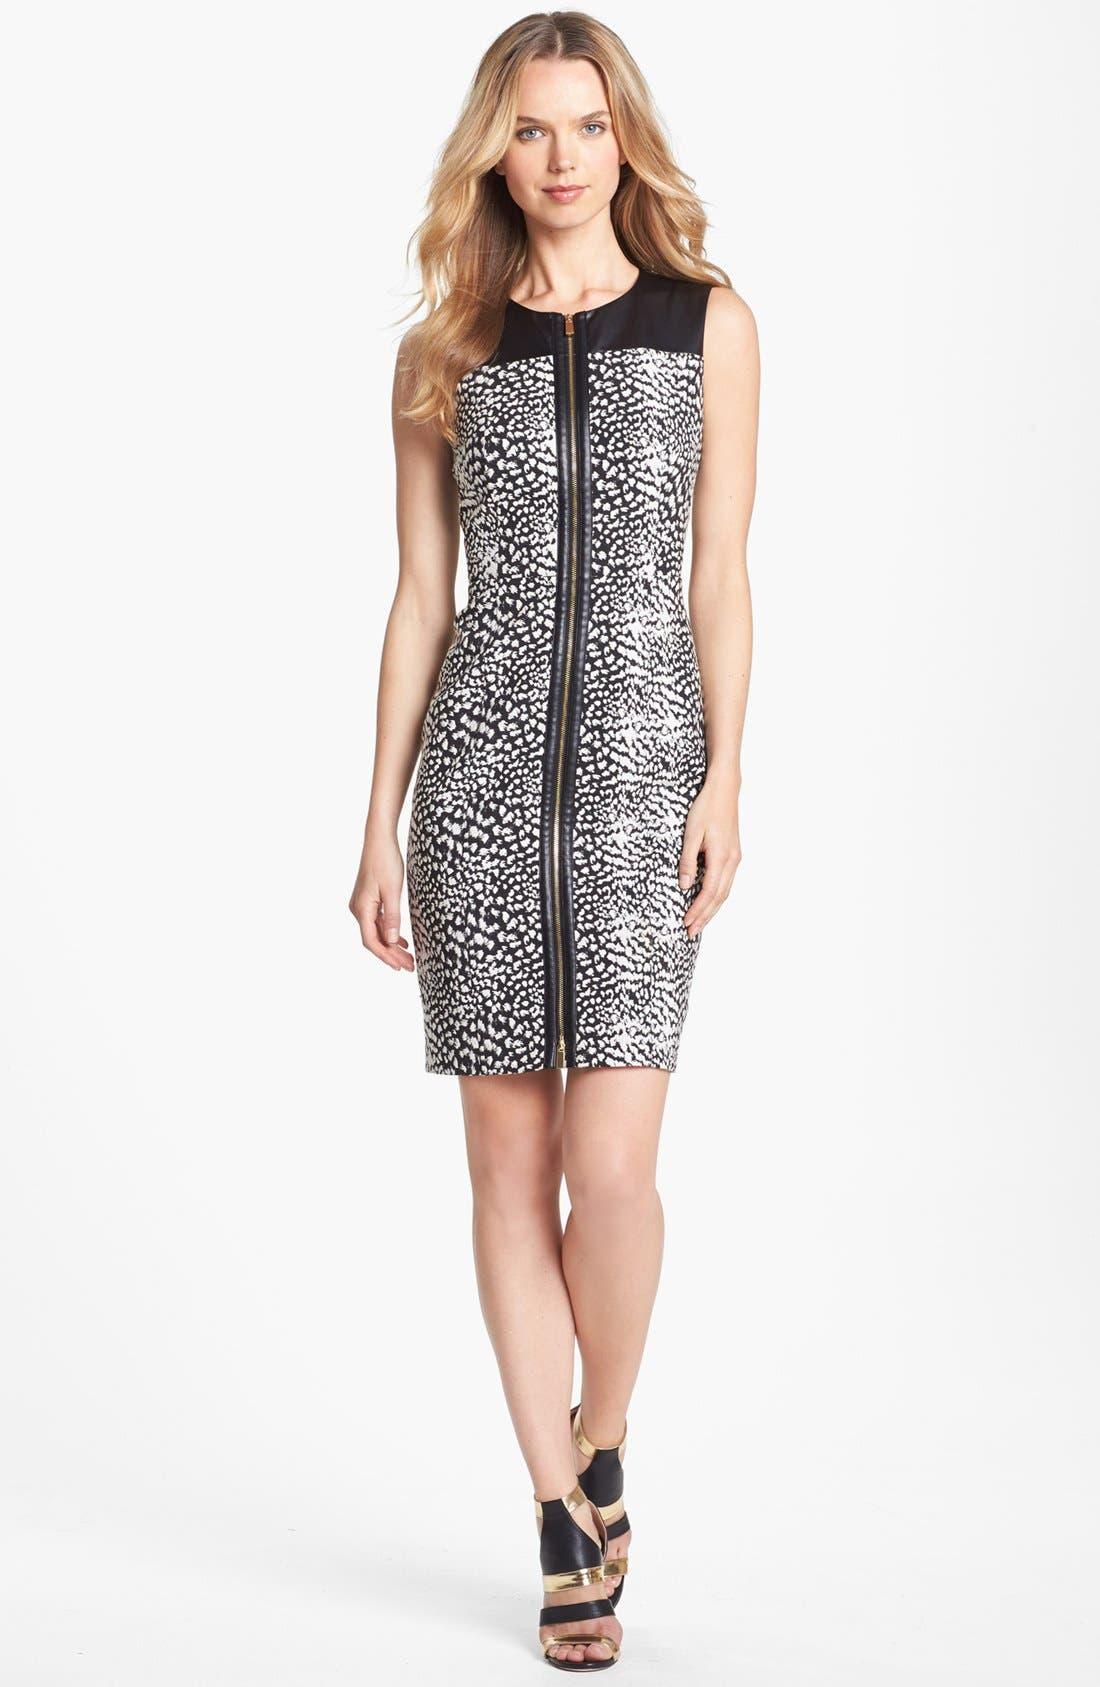 Main Image - Vince Camuto Faux Leather Detail Print Zip Front Dress (Petite)